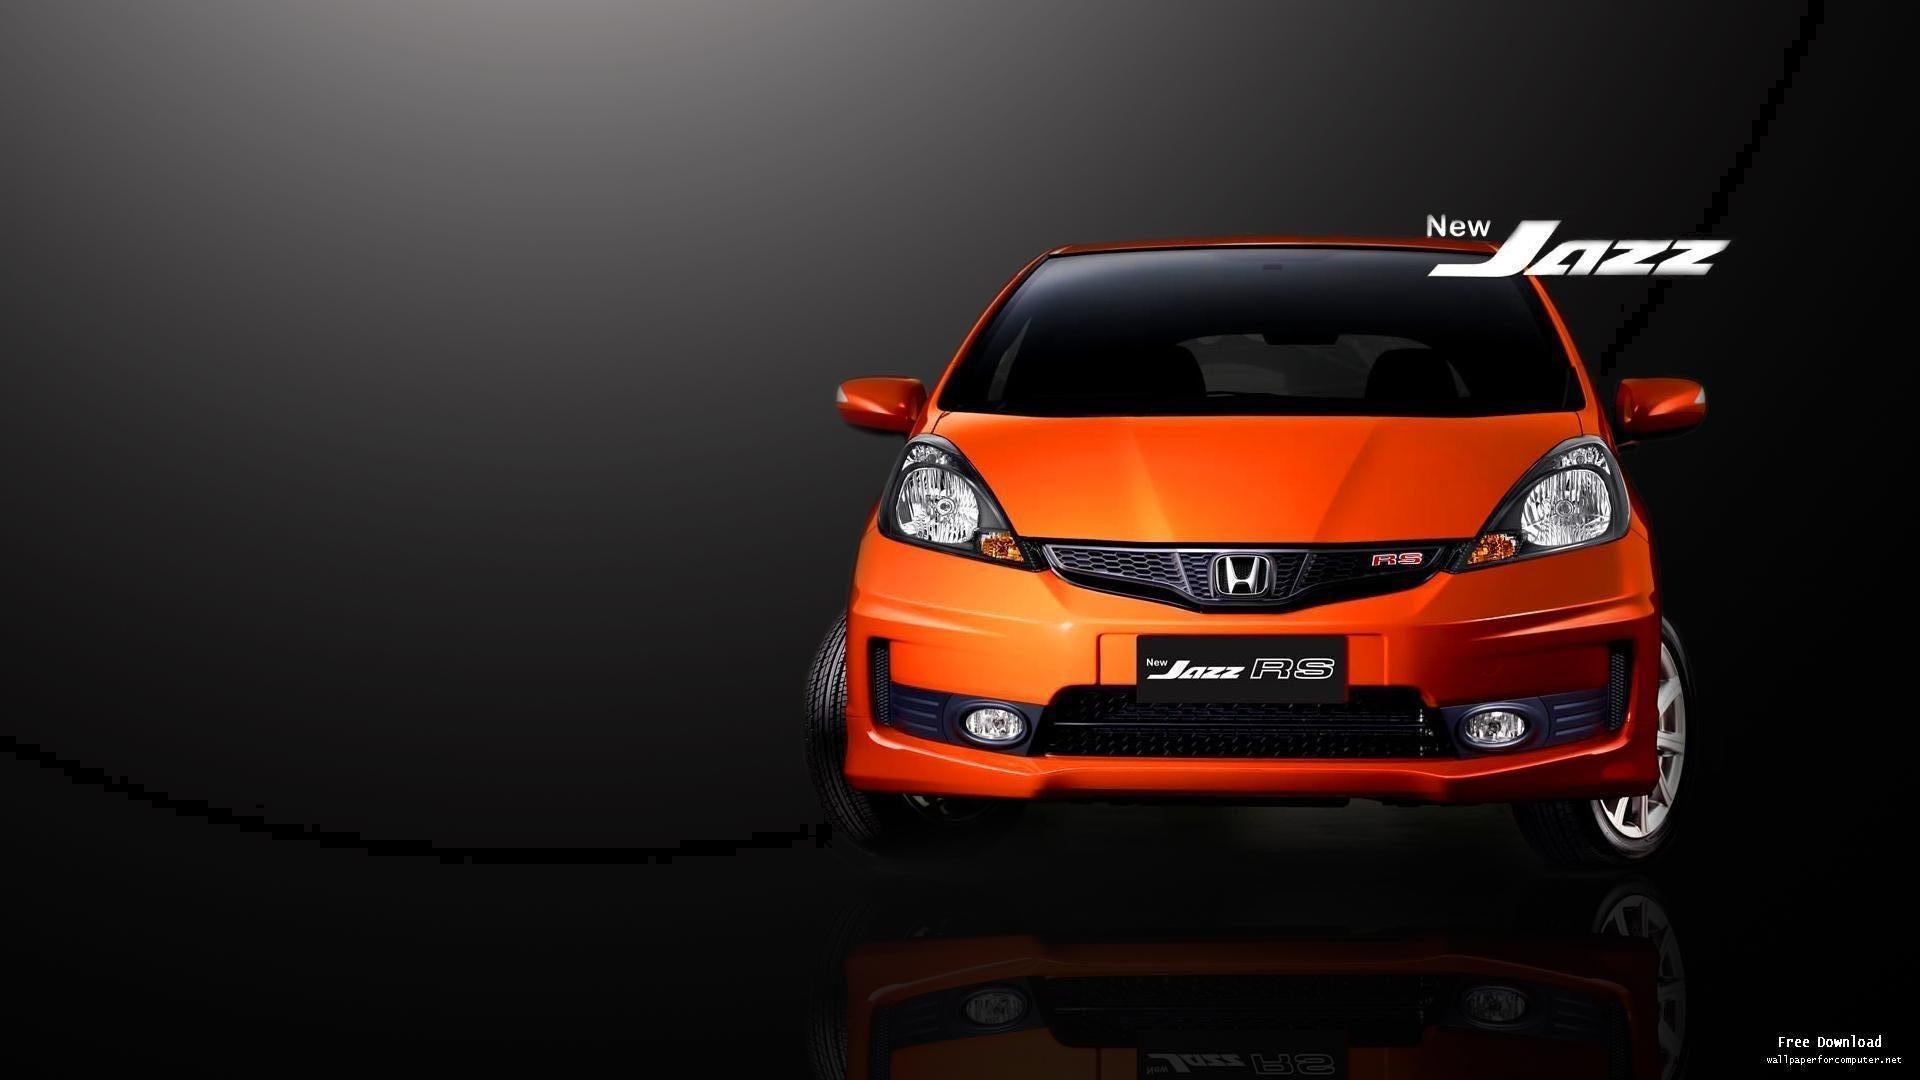 Kekurangan Honda Jazz Rs 2013 Review